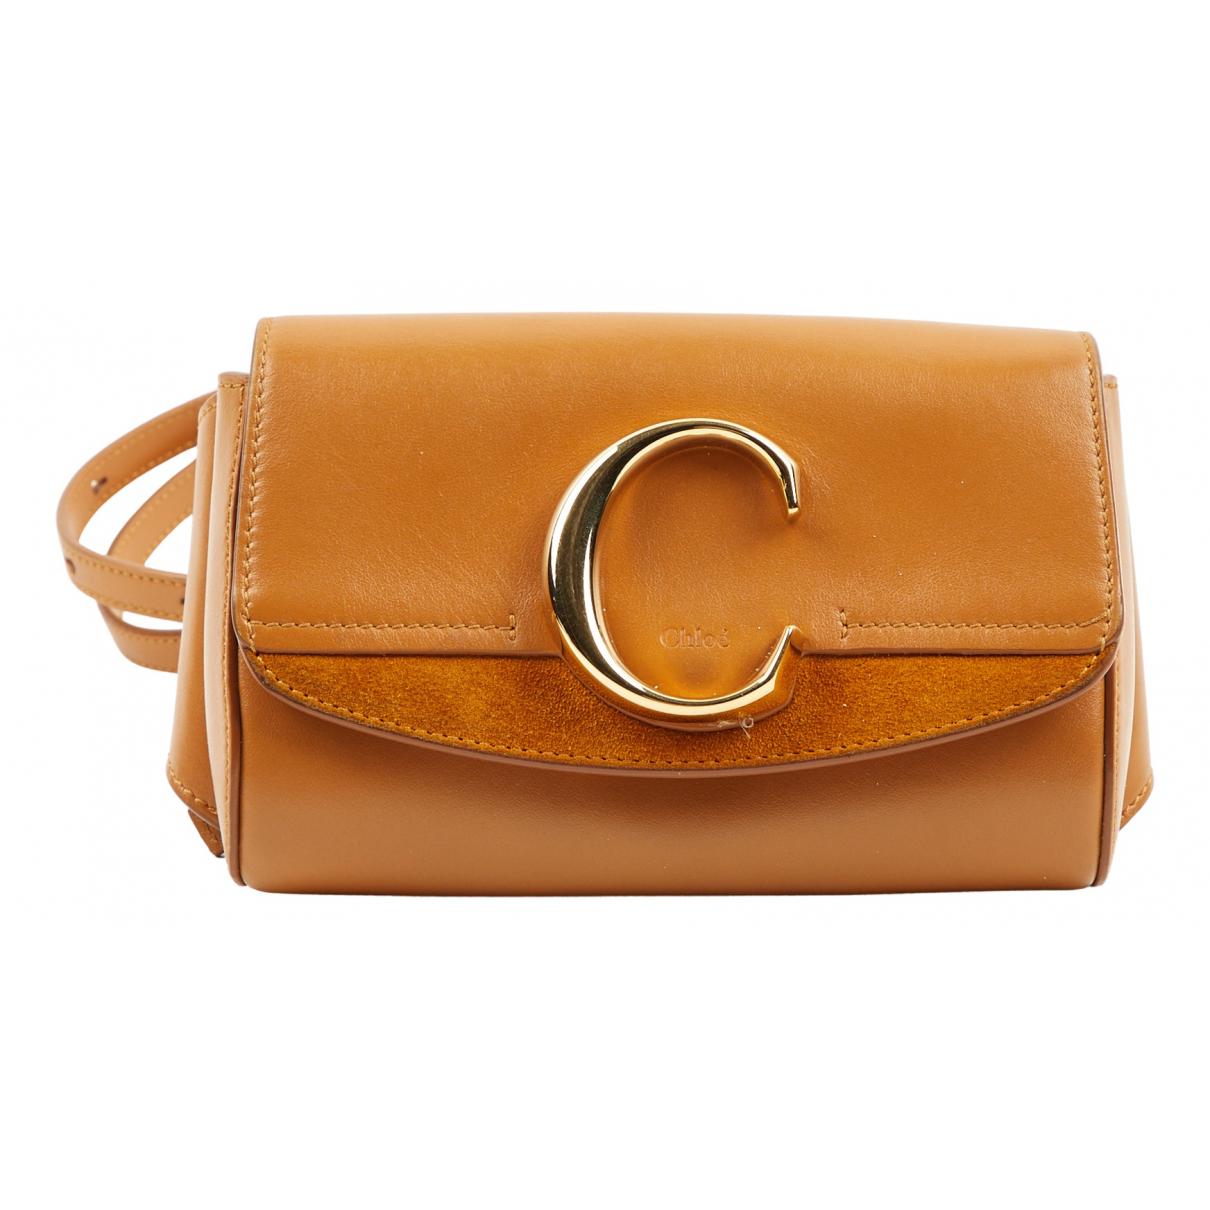 Chloe - Sac a main C pour femme en cuir - camel